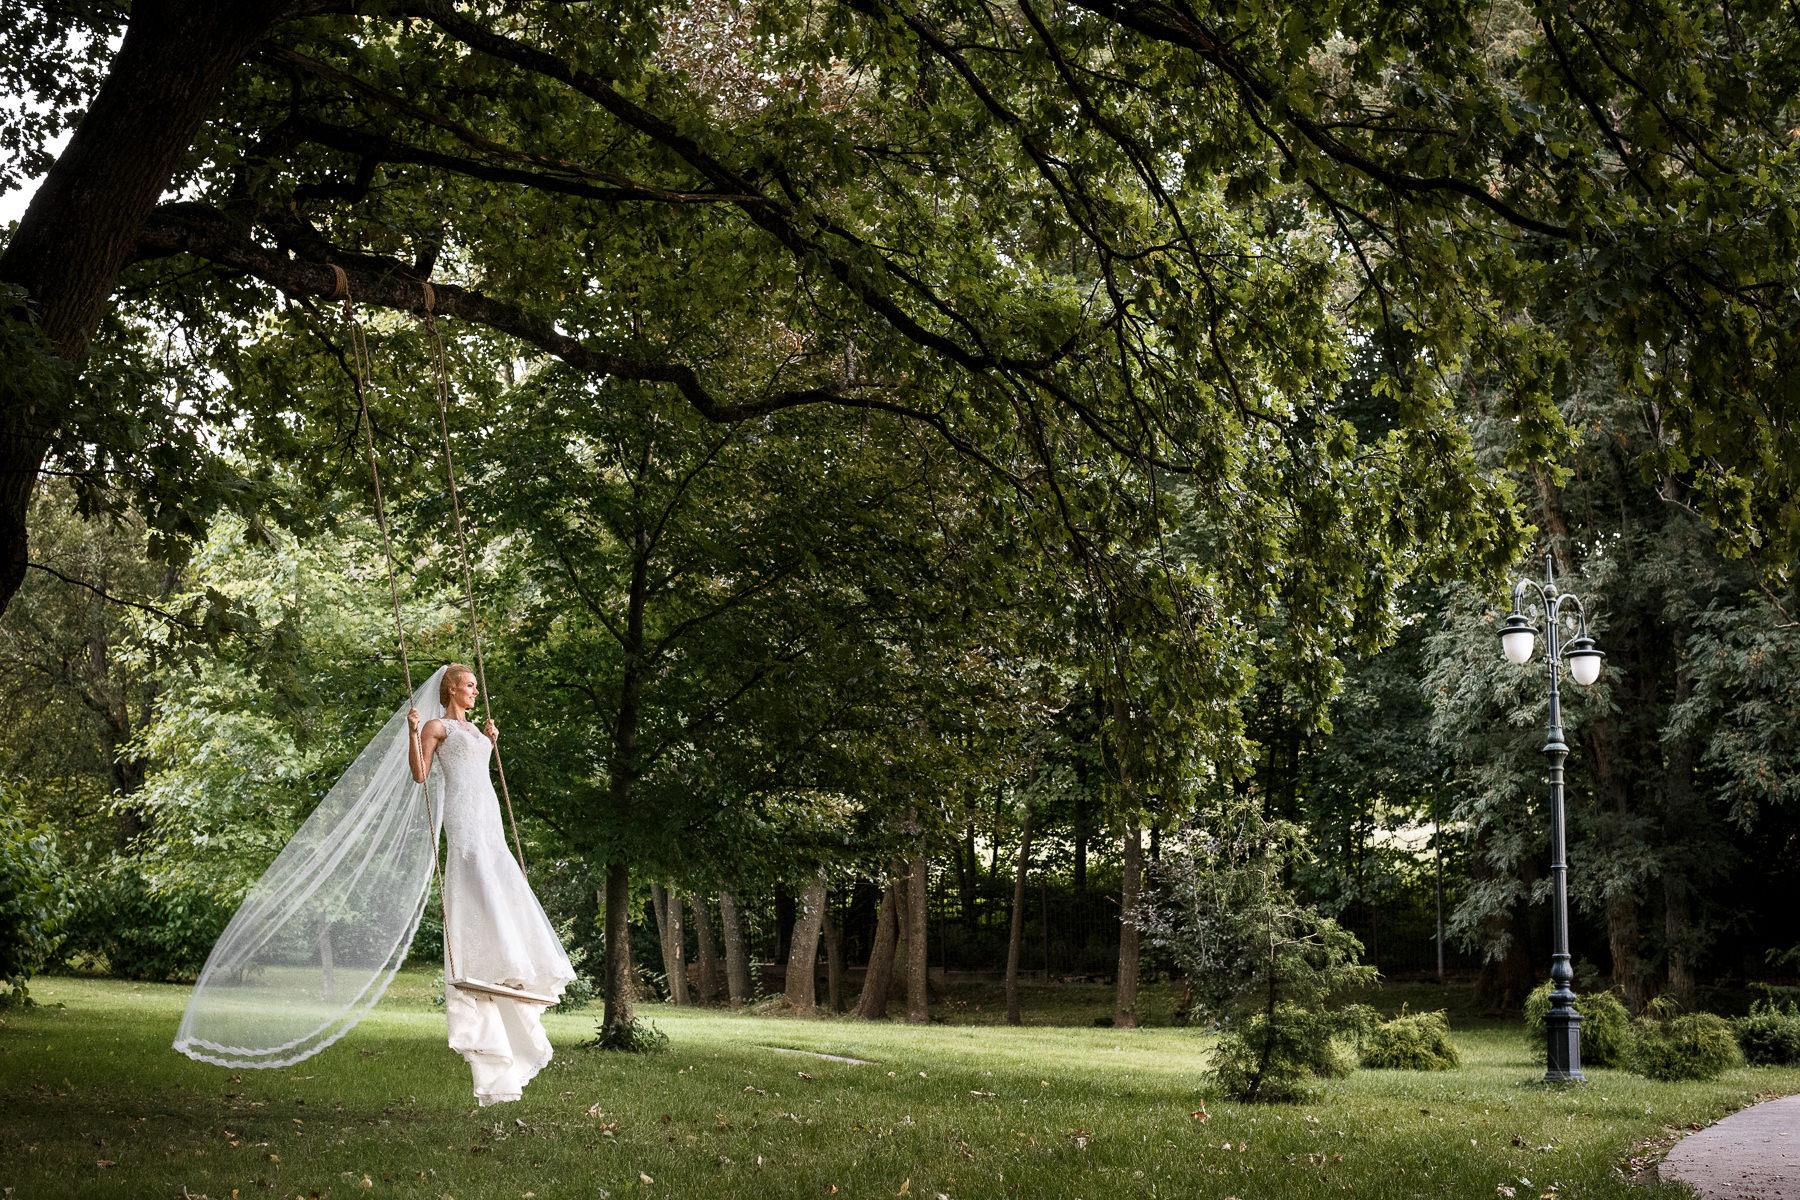 classy wedding photoshoot